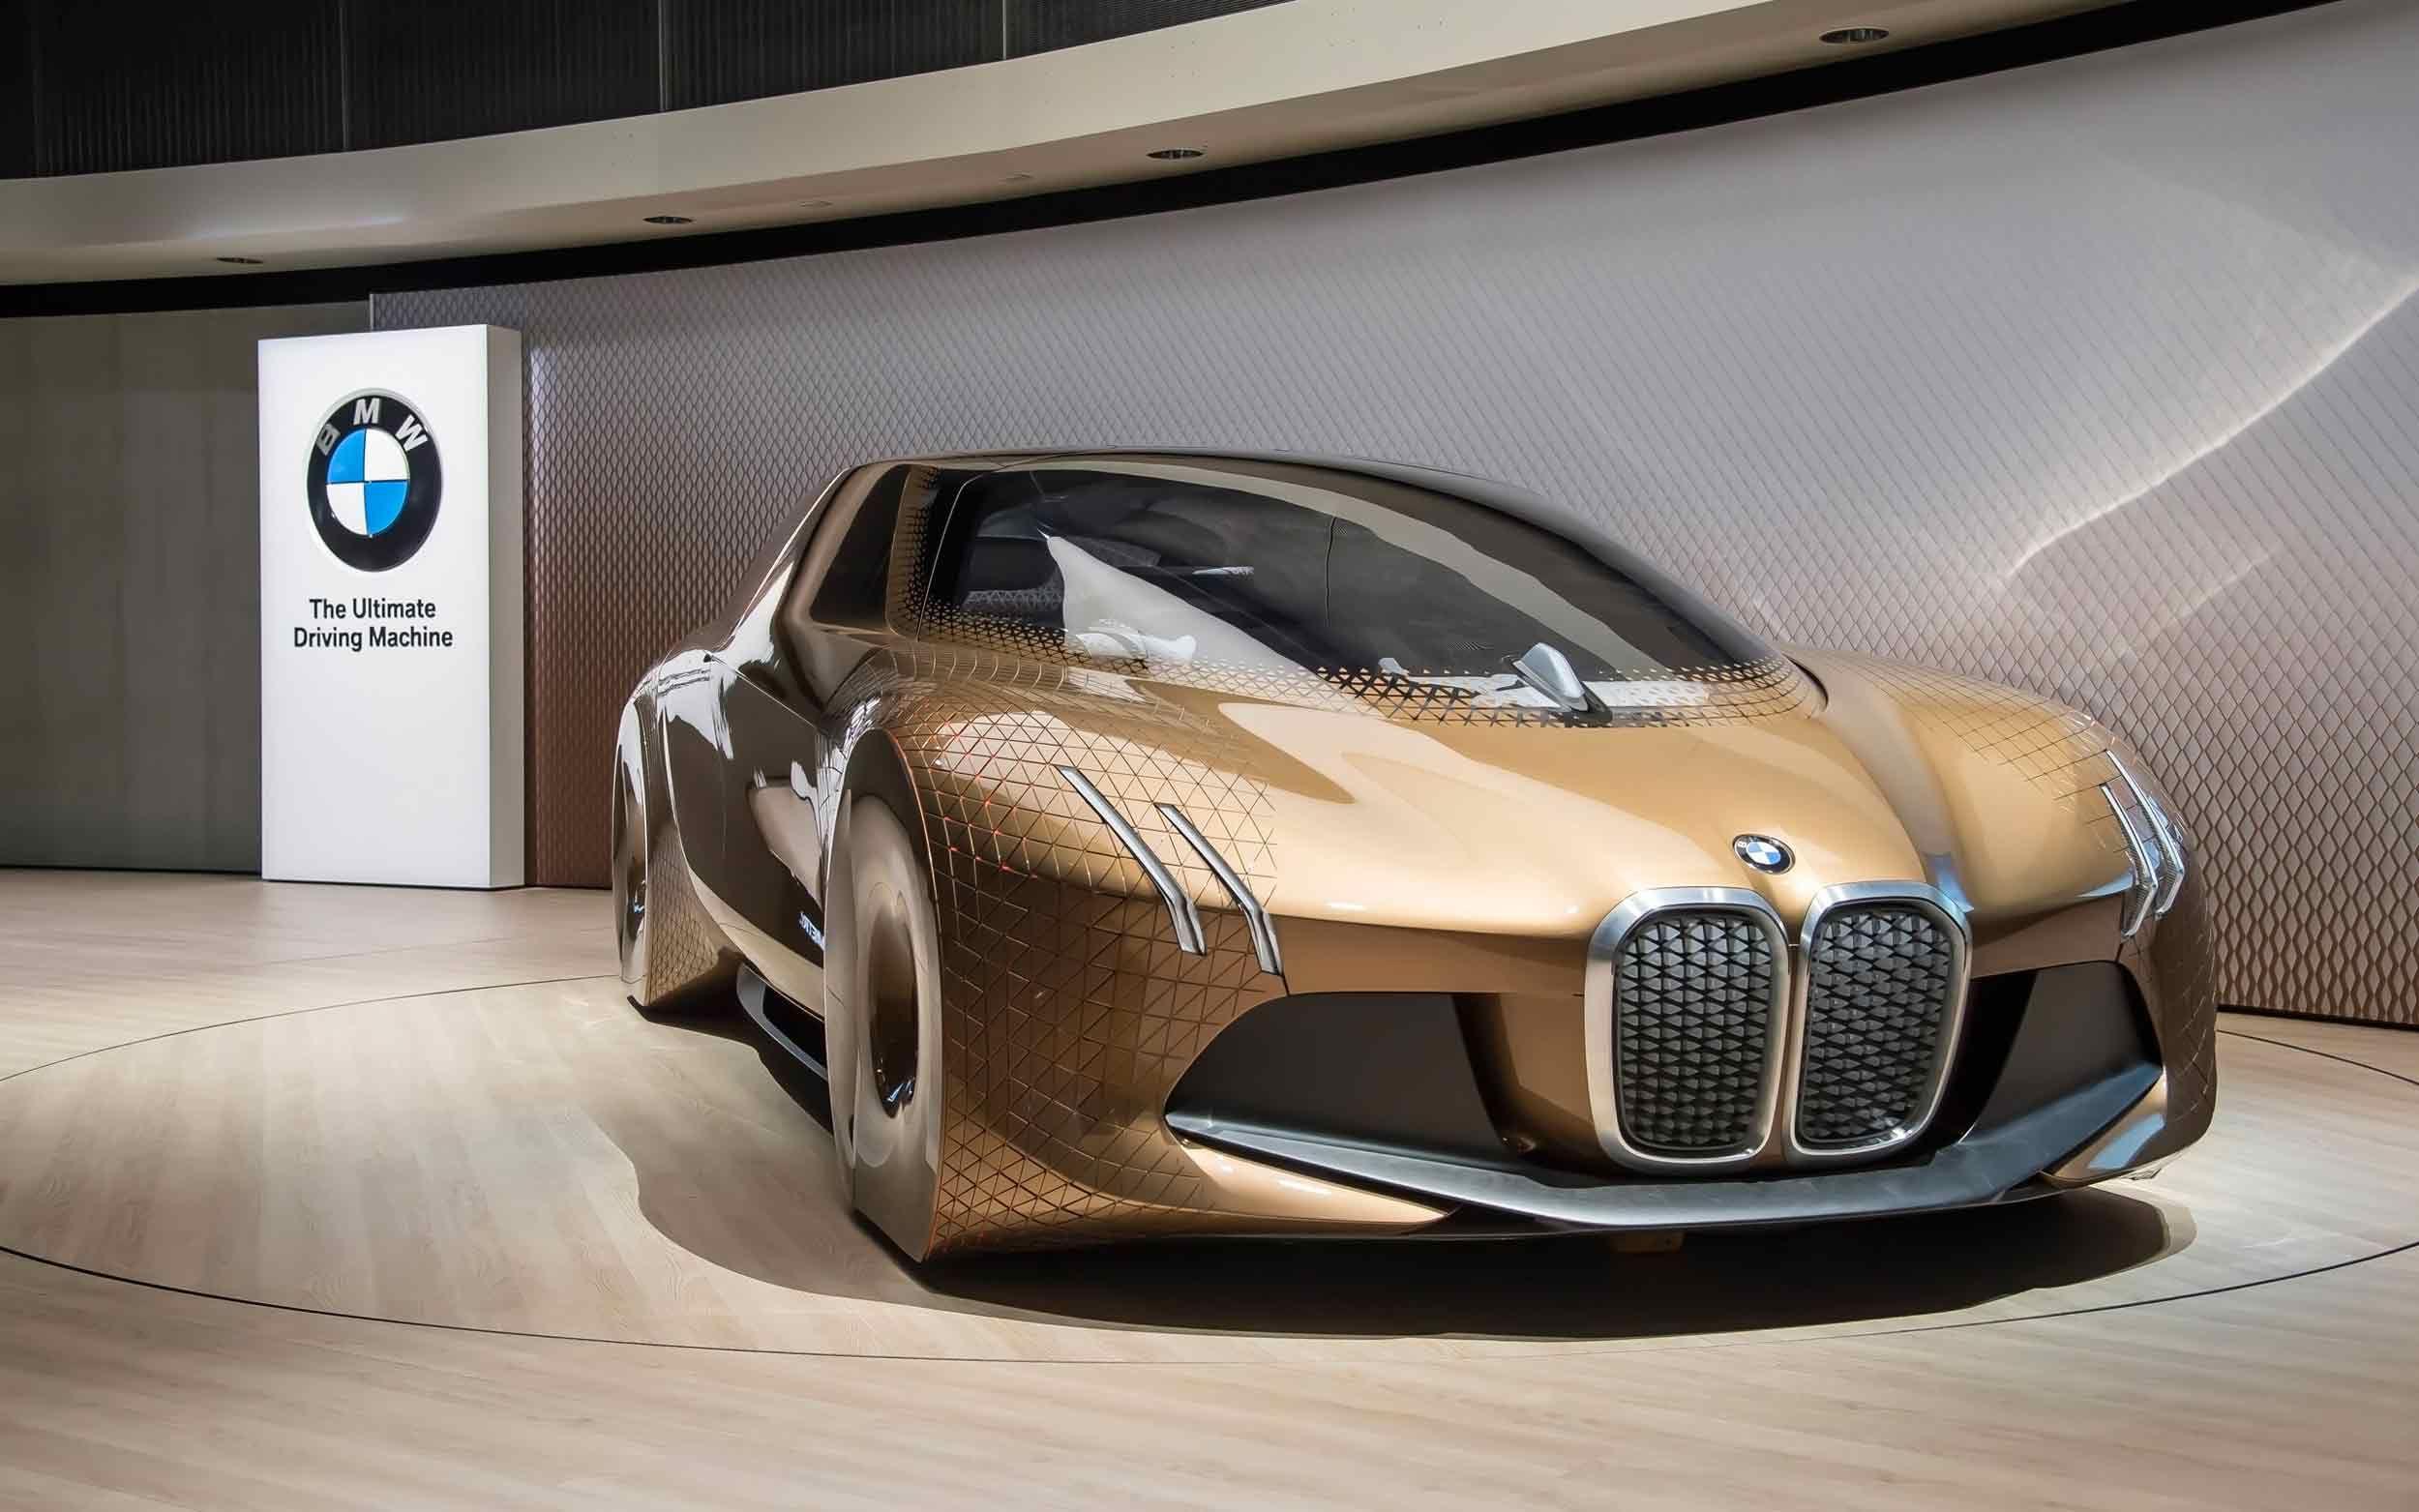 Bmw Vision Next 100 Supercar Blondie Parametric Architecture Bmw Next 100 Super Cars Bmw